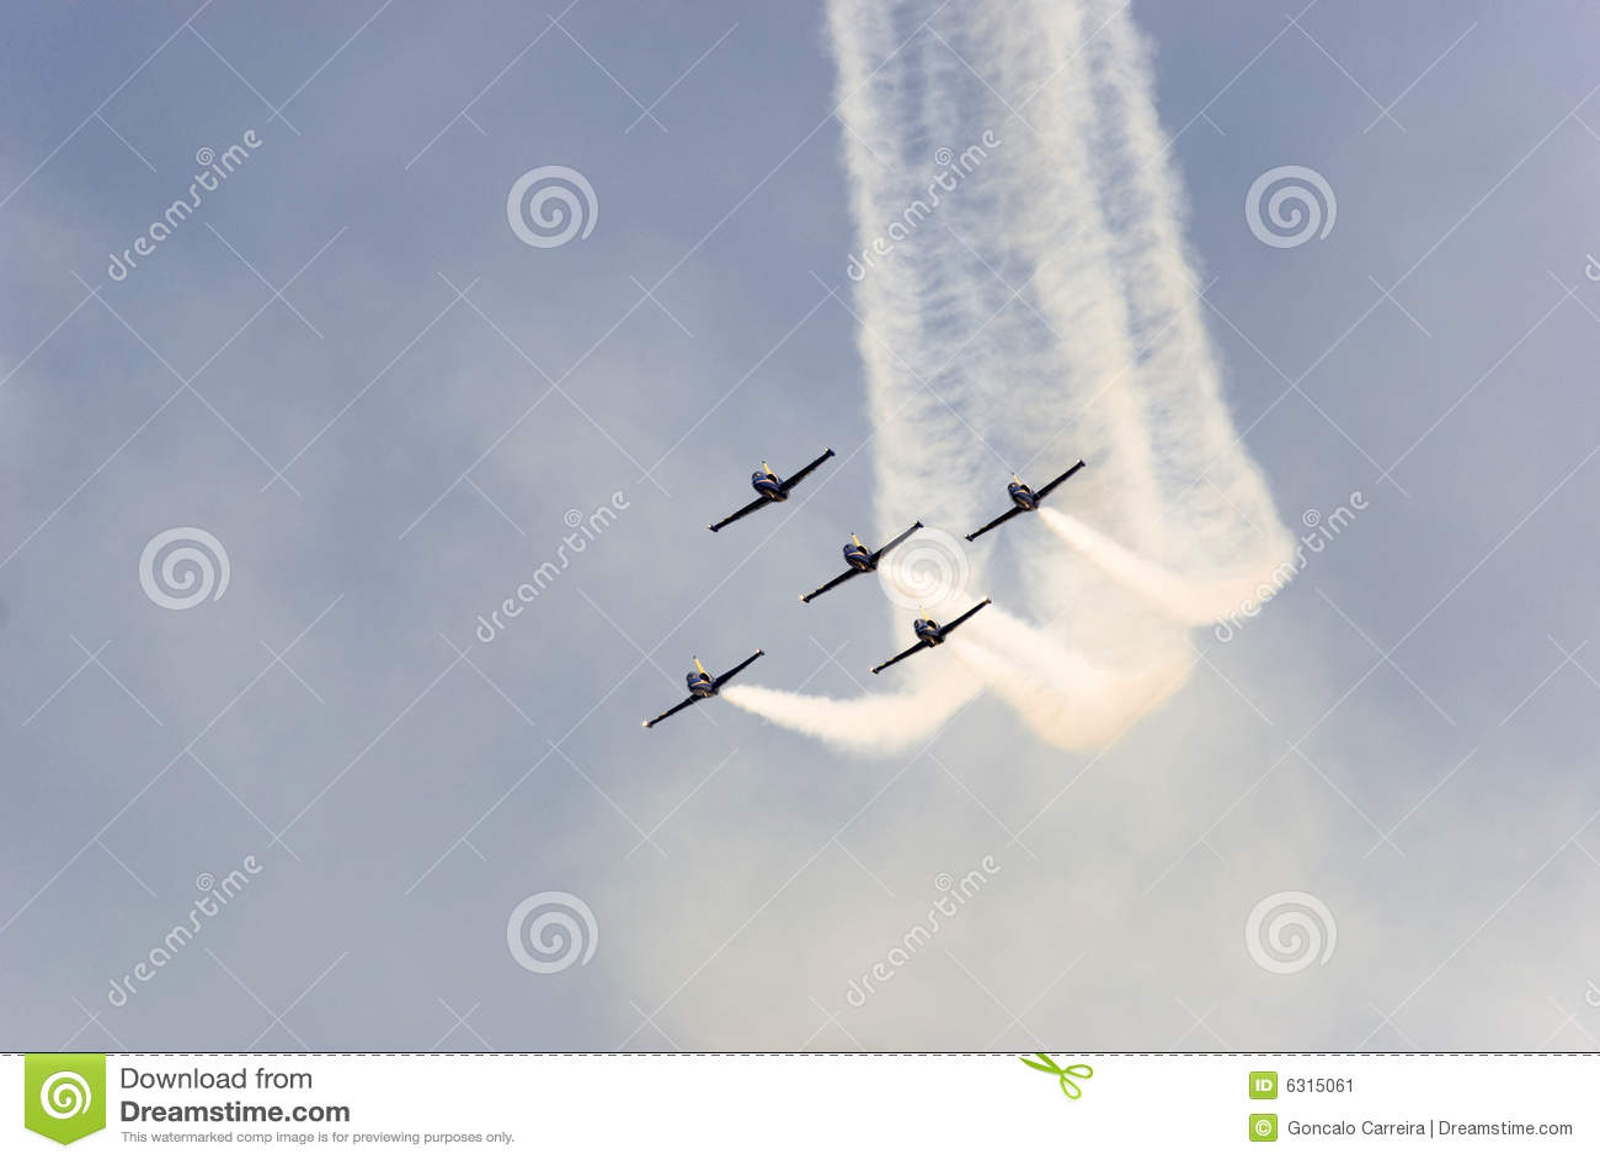 Luftrace